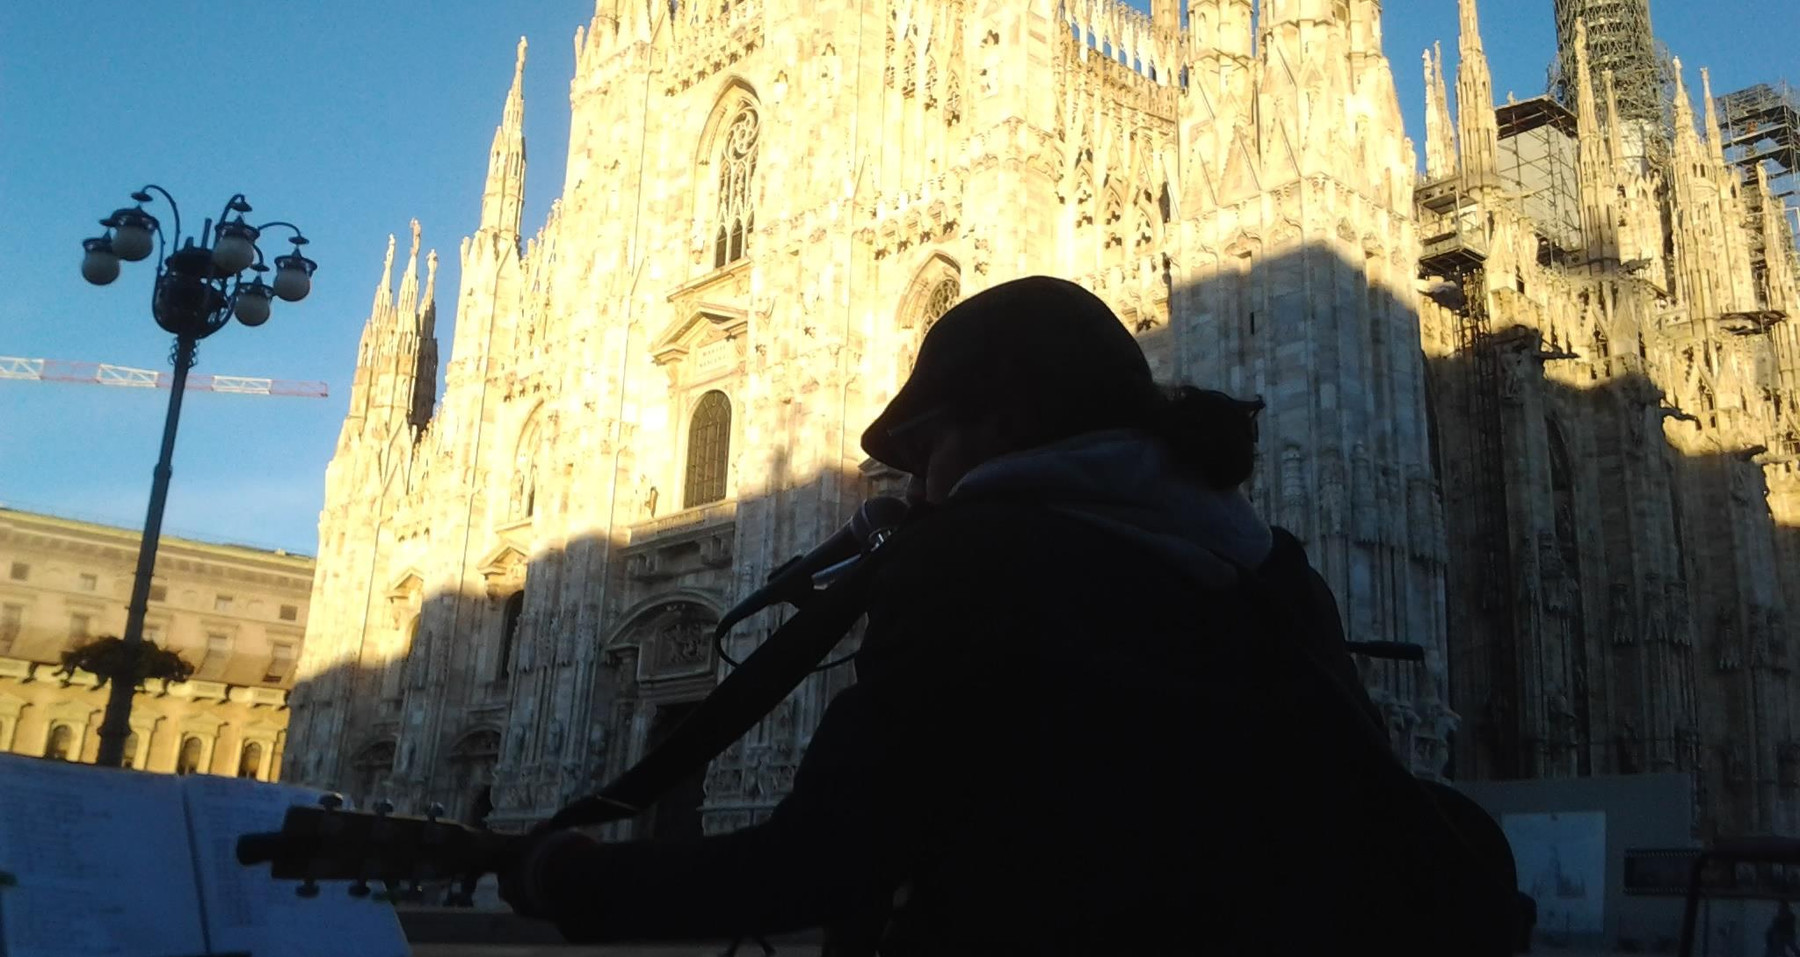 20121203_Duomo900_MI (7).jpg